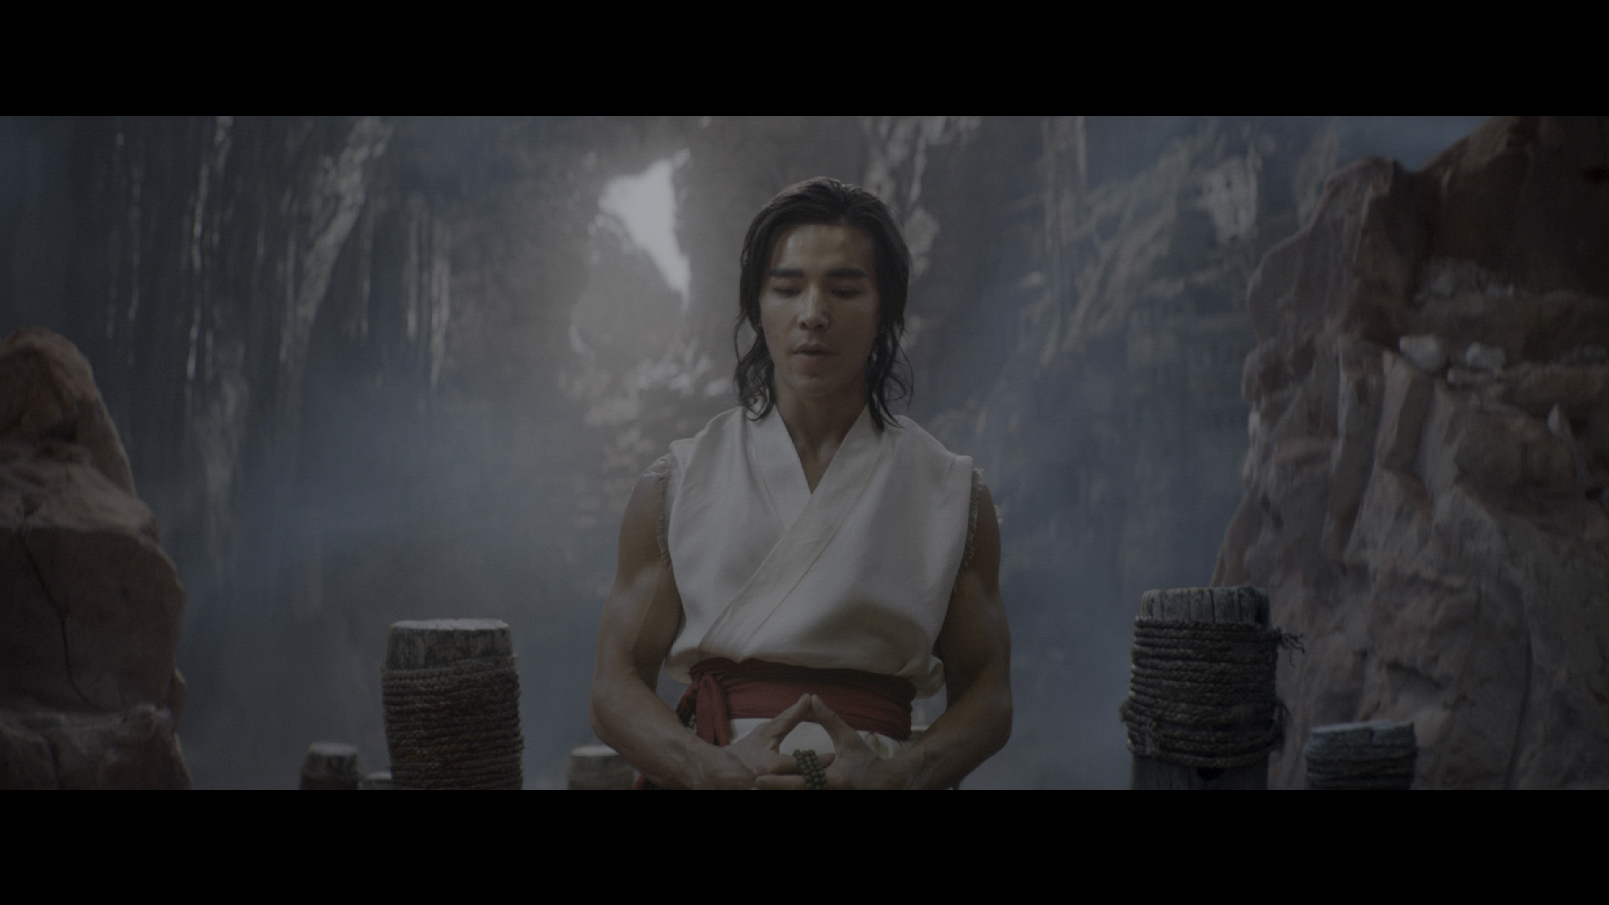 Mortal-Kombat-2021-2160p-HMAX-WEB-DL-DDP5-1-Atmos-HDR-HEVC-Telly-mkv-snapshot-01-01-23-680